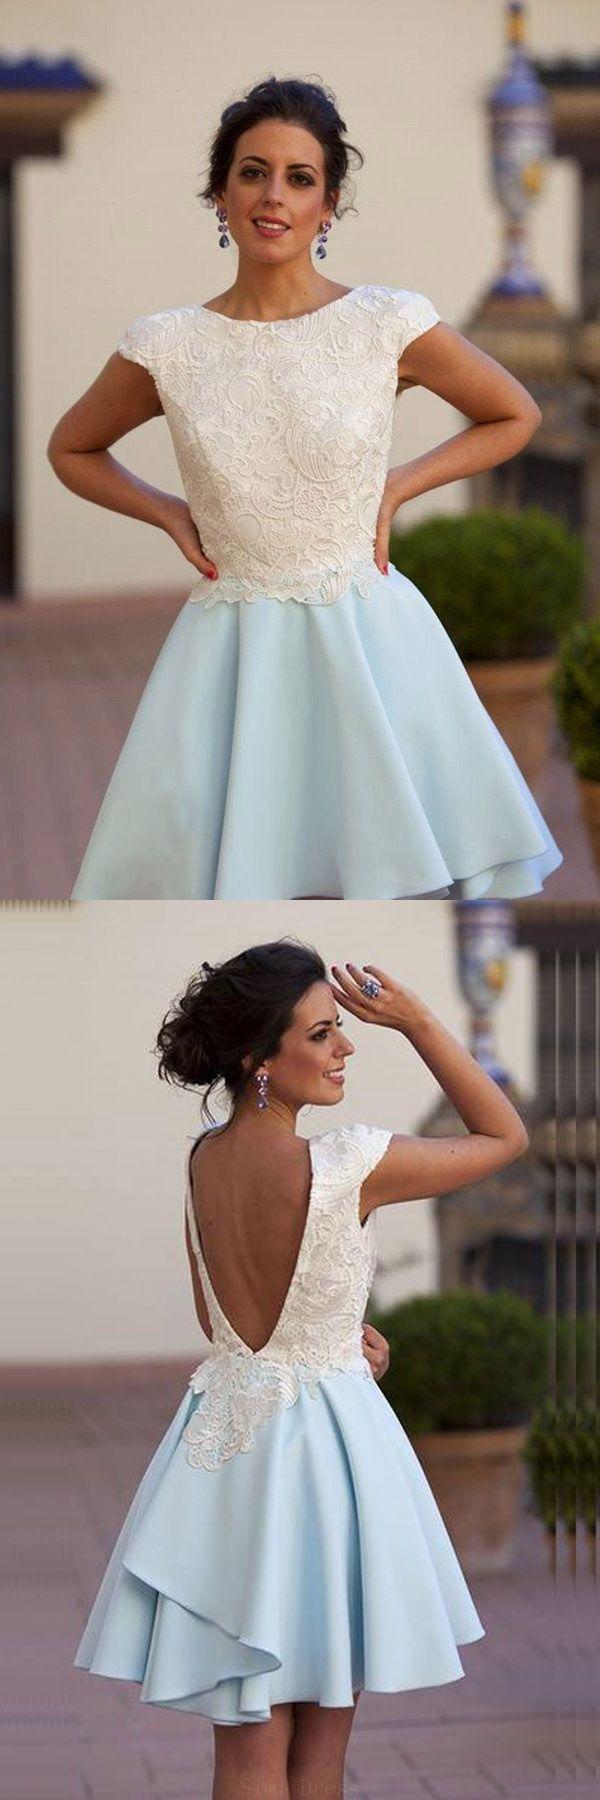 Customized easy prom dresses chiffon bateau kneelength light blue